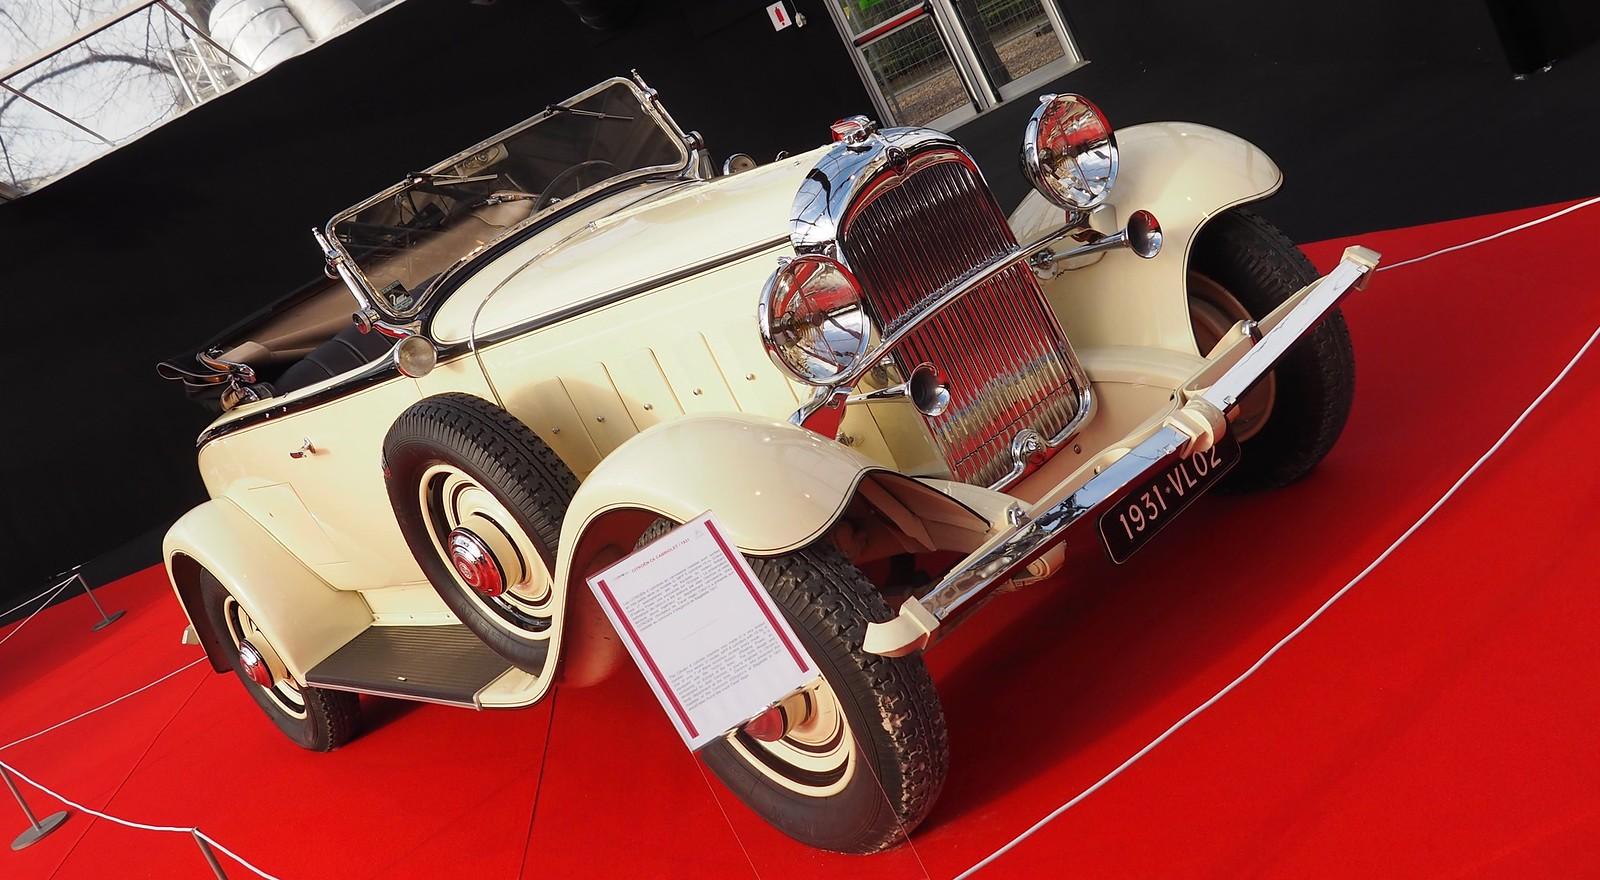 citroen c6 cabriolet 15 chx grand luxe 1931 concept car paris invalides f vrier 2018 flickr. Black Bedroom Furniture Sets. Home Design Ideas